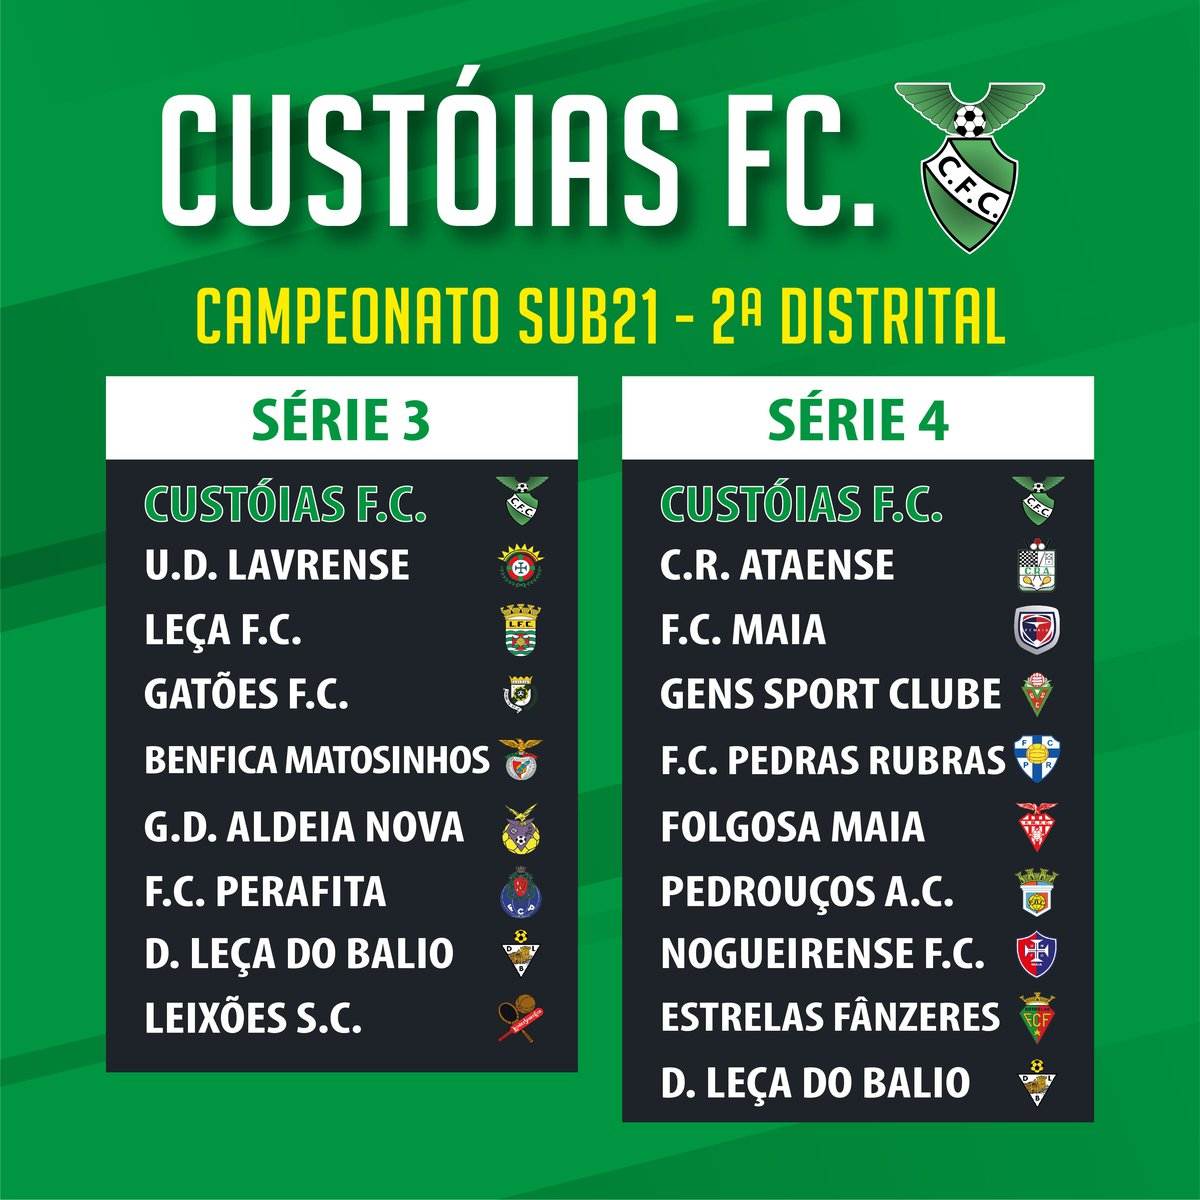 Campeonato Sub21 - 2ª distrital